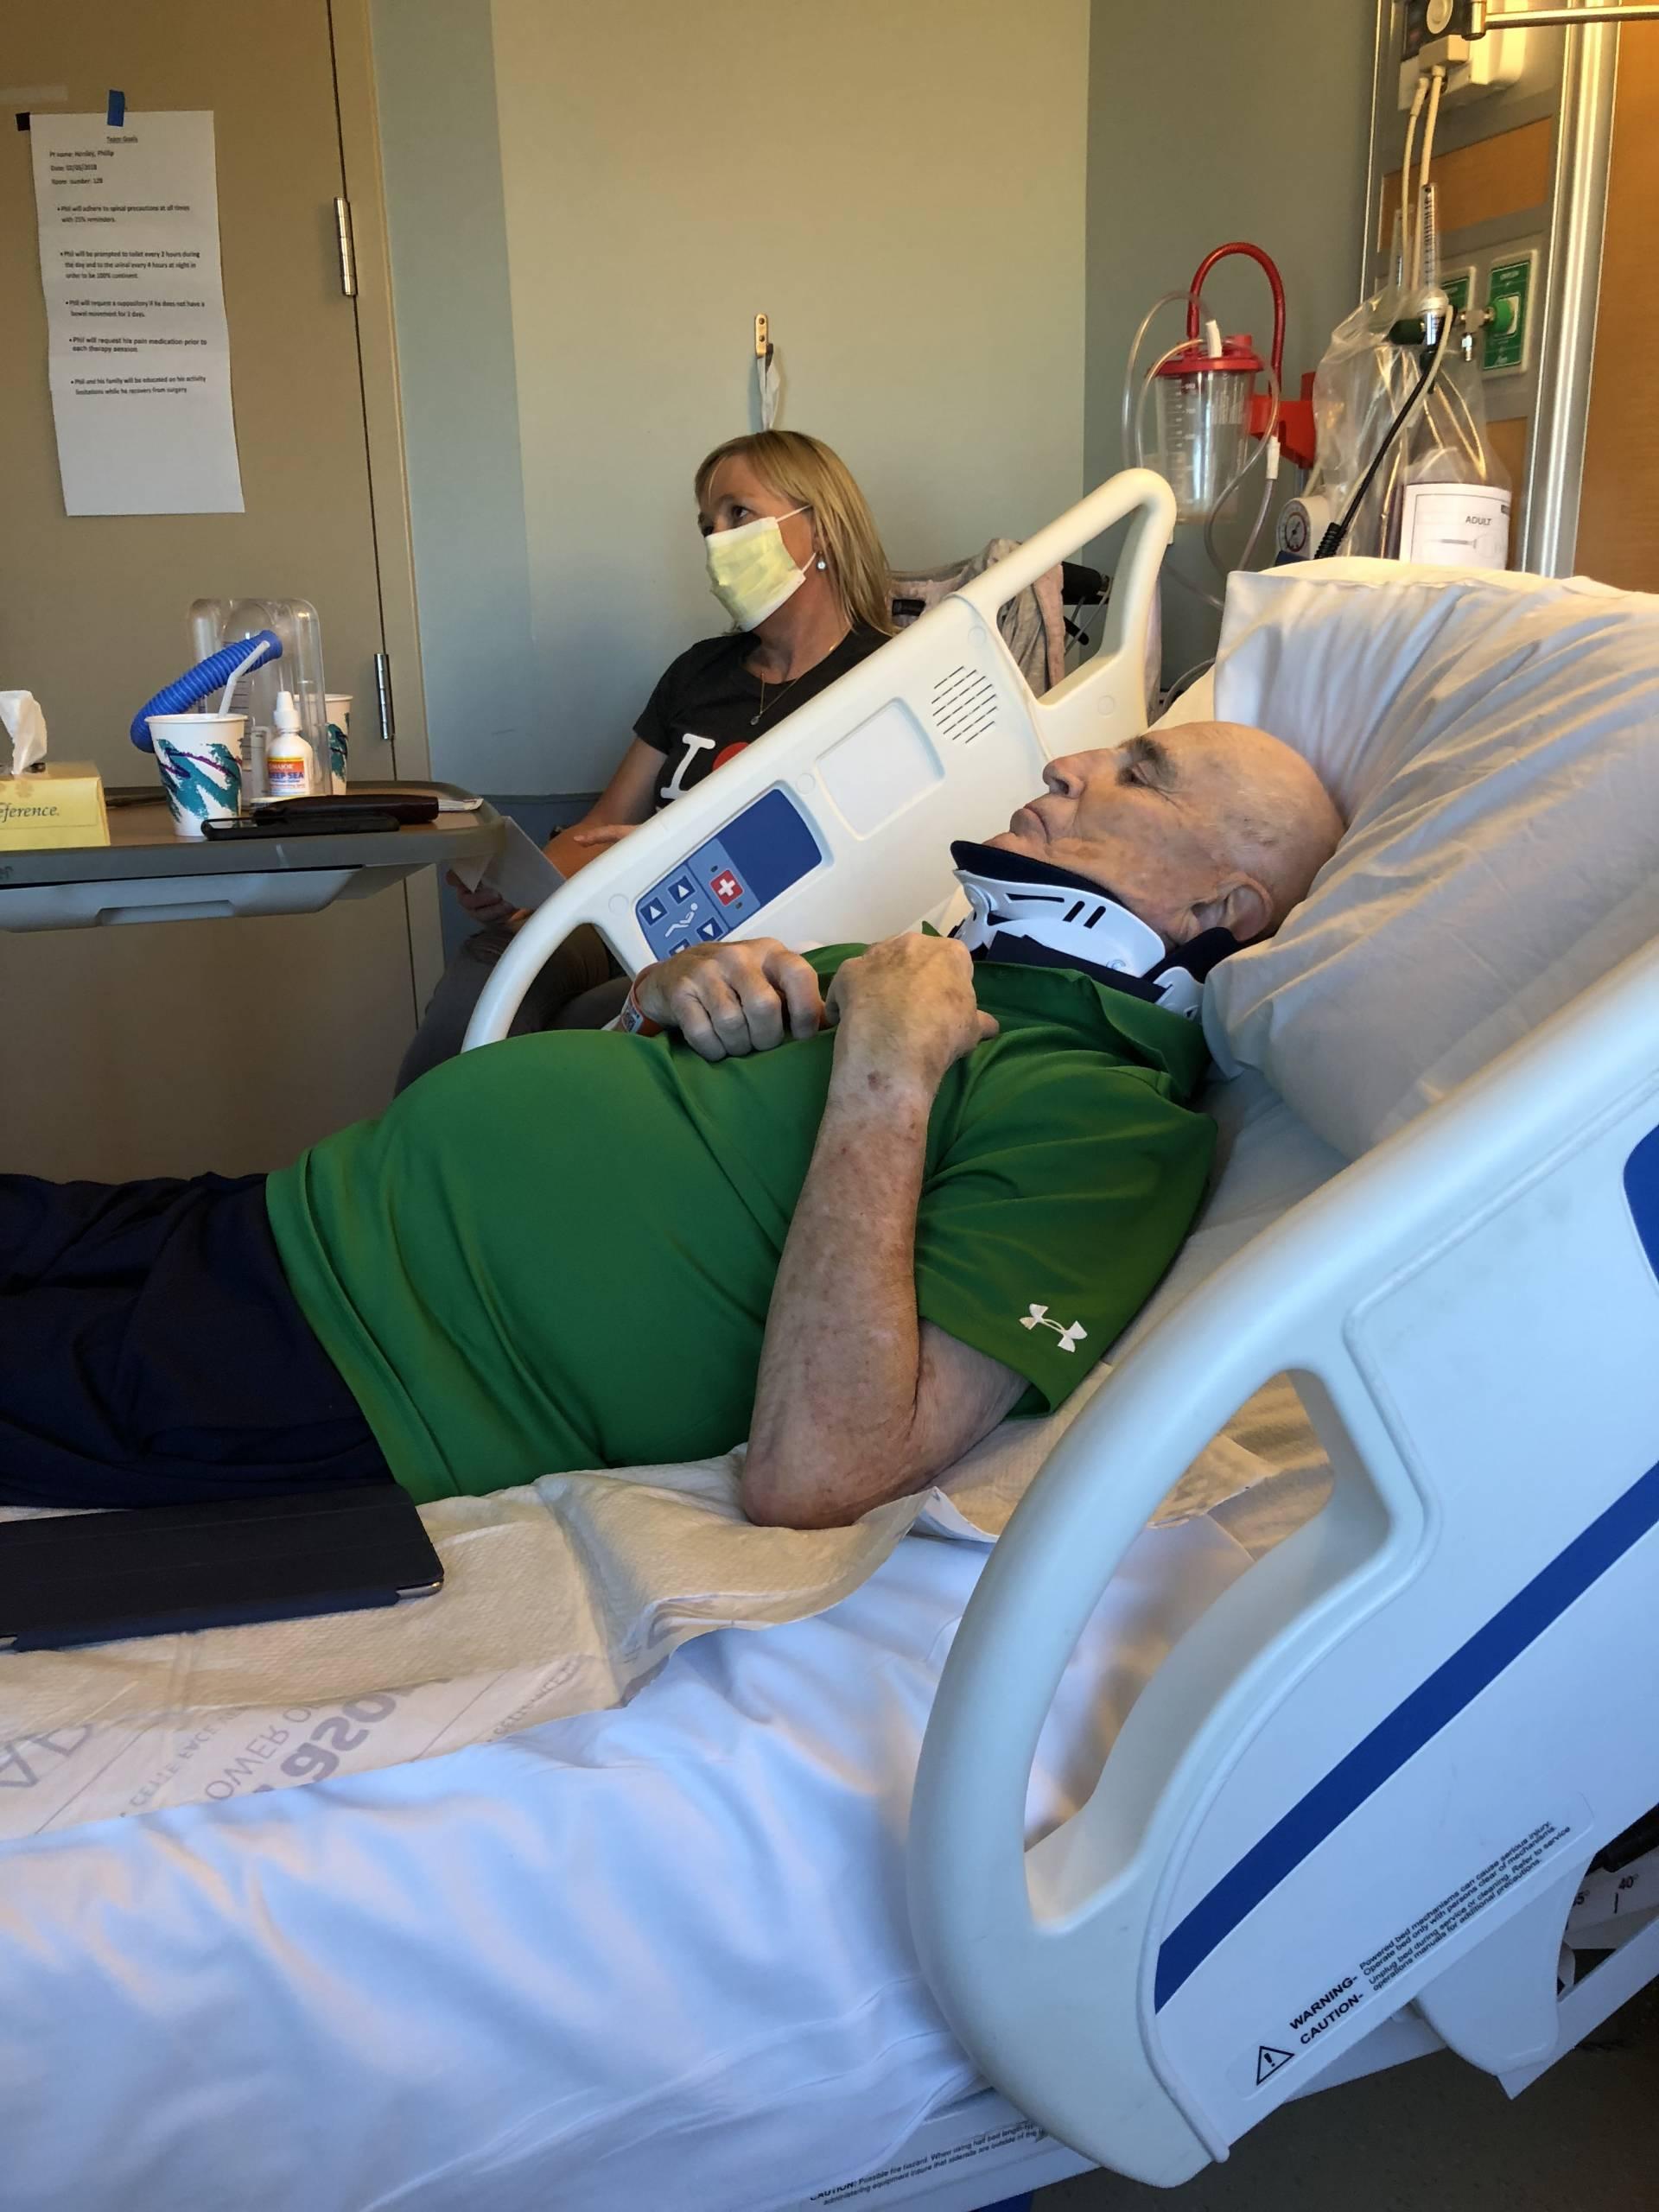 Phil-Horsley-in-hospital